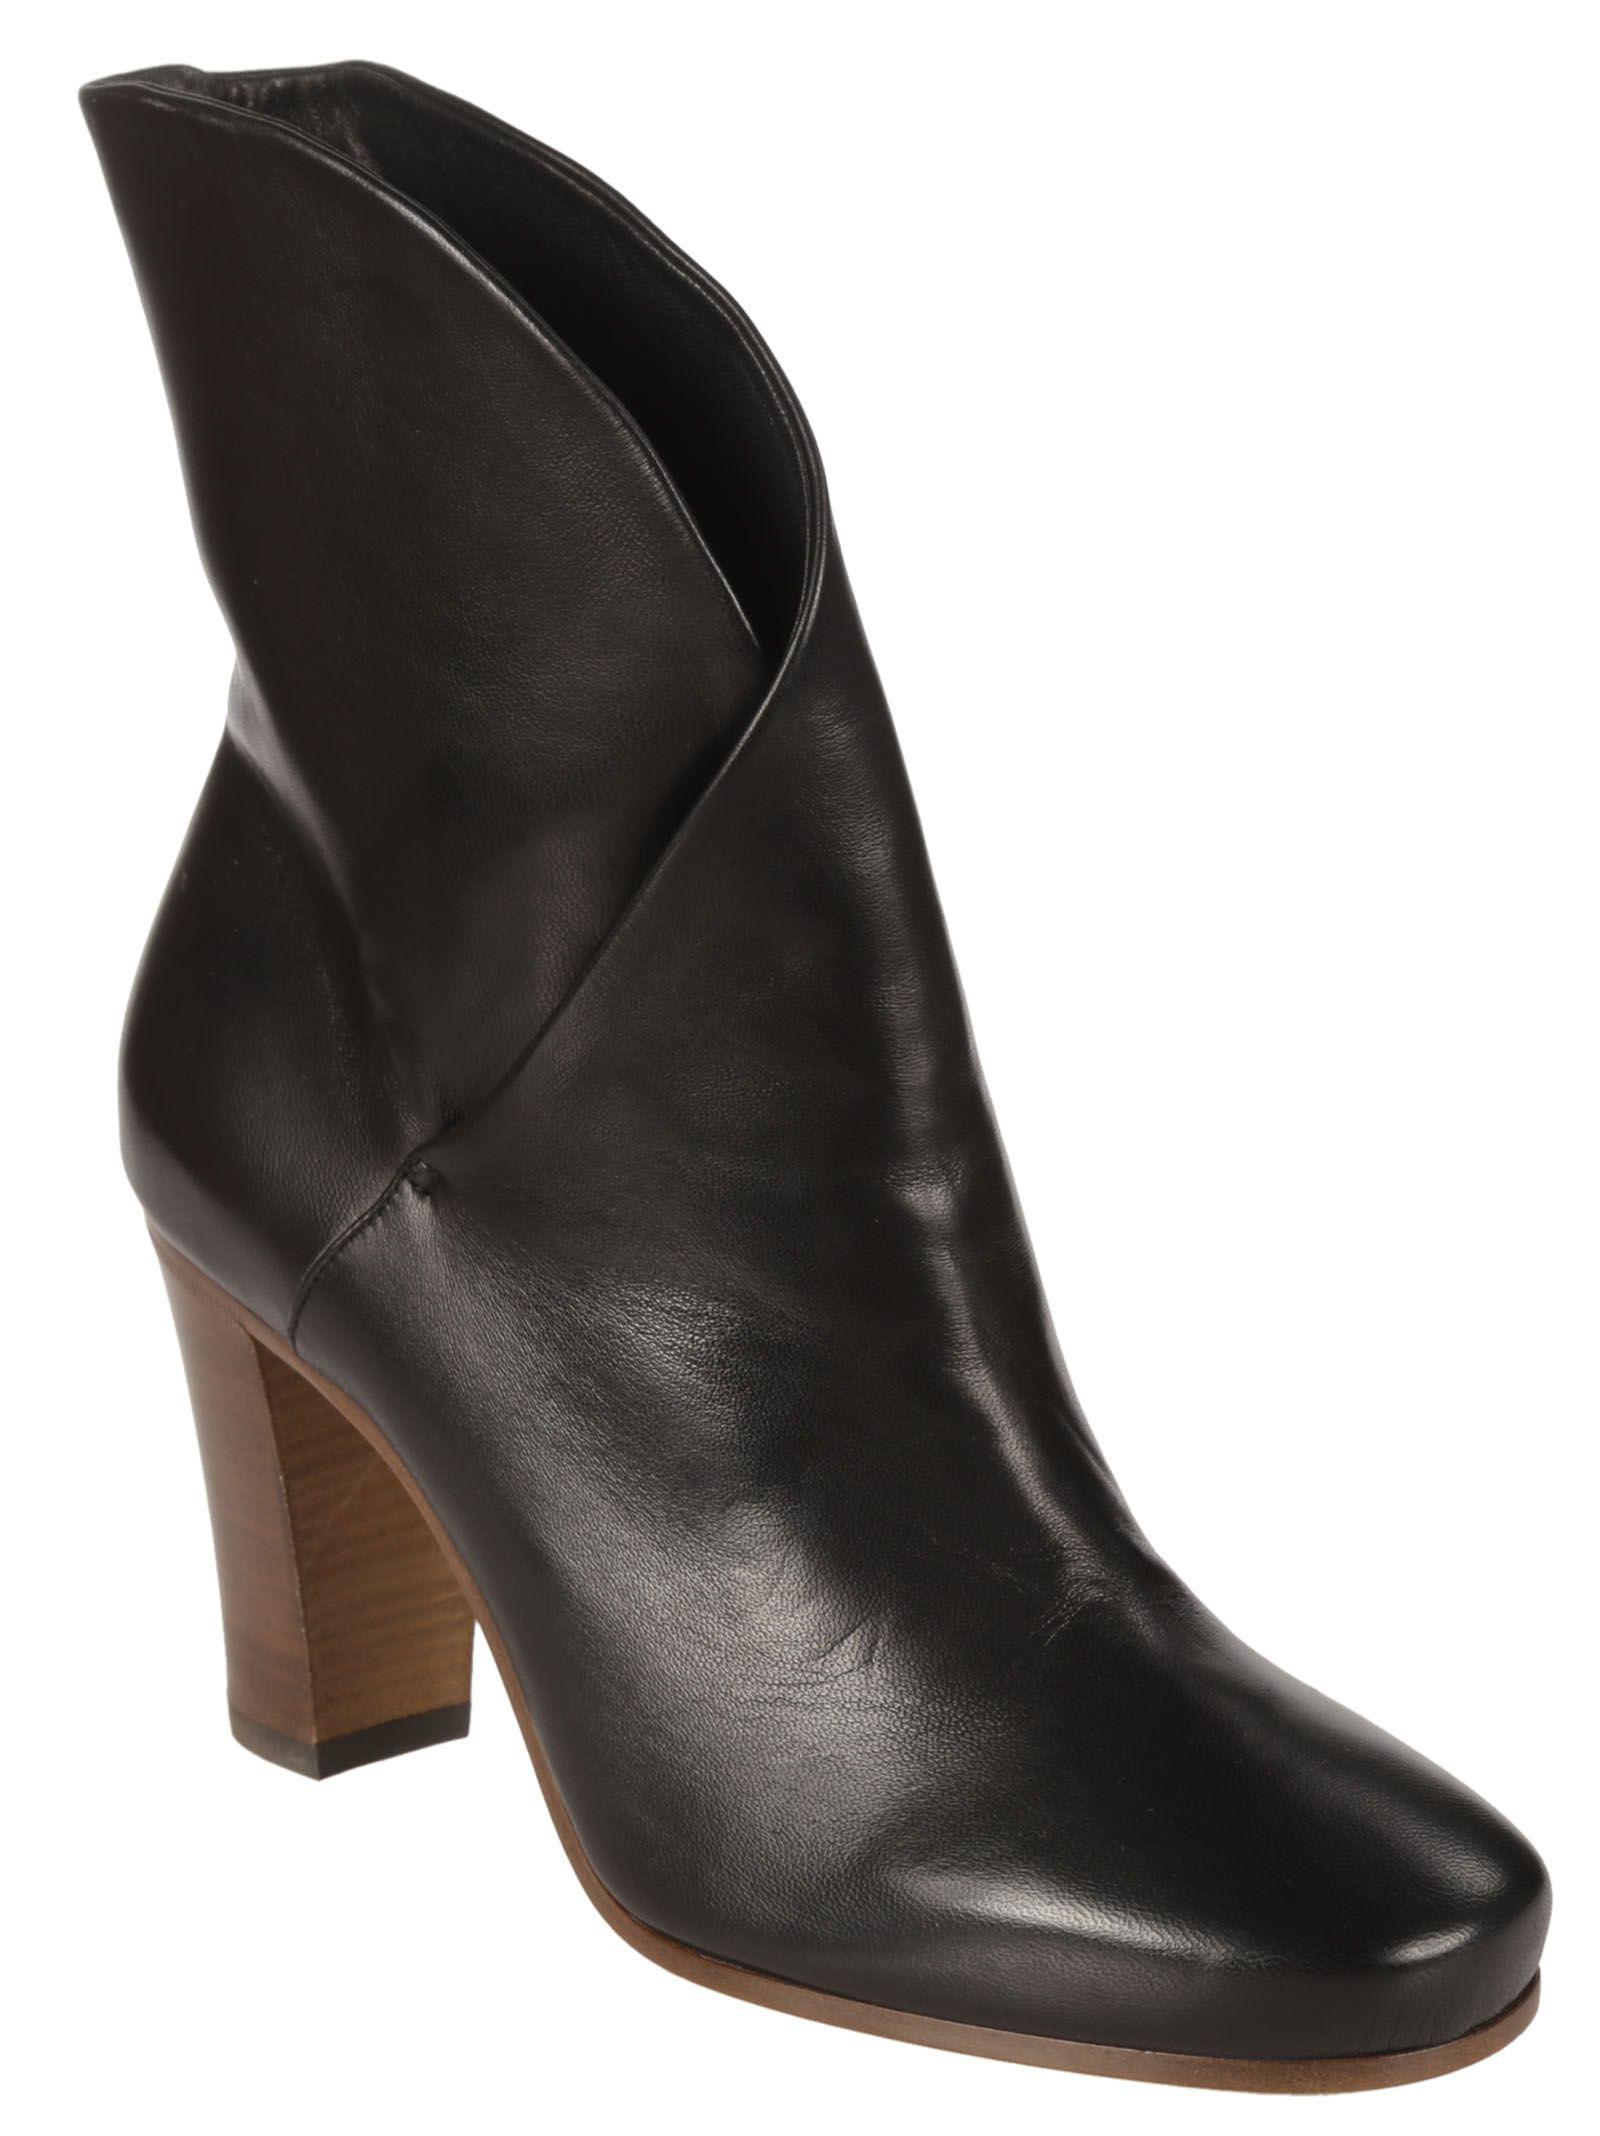 Celine - Celine Leather Ankle Boots